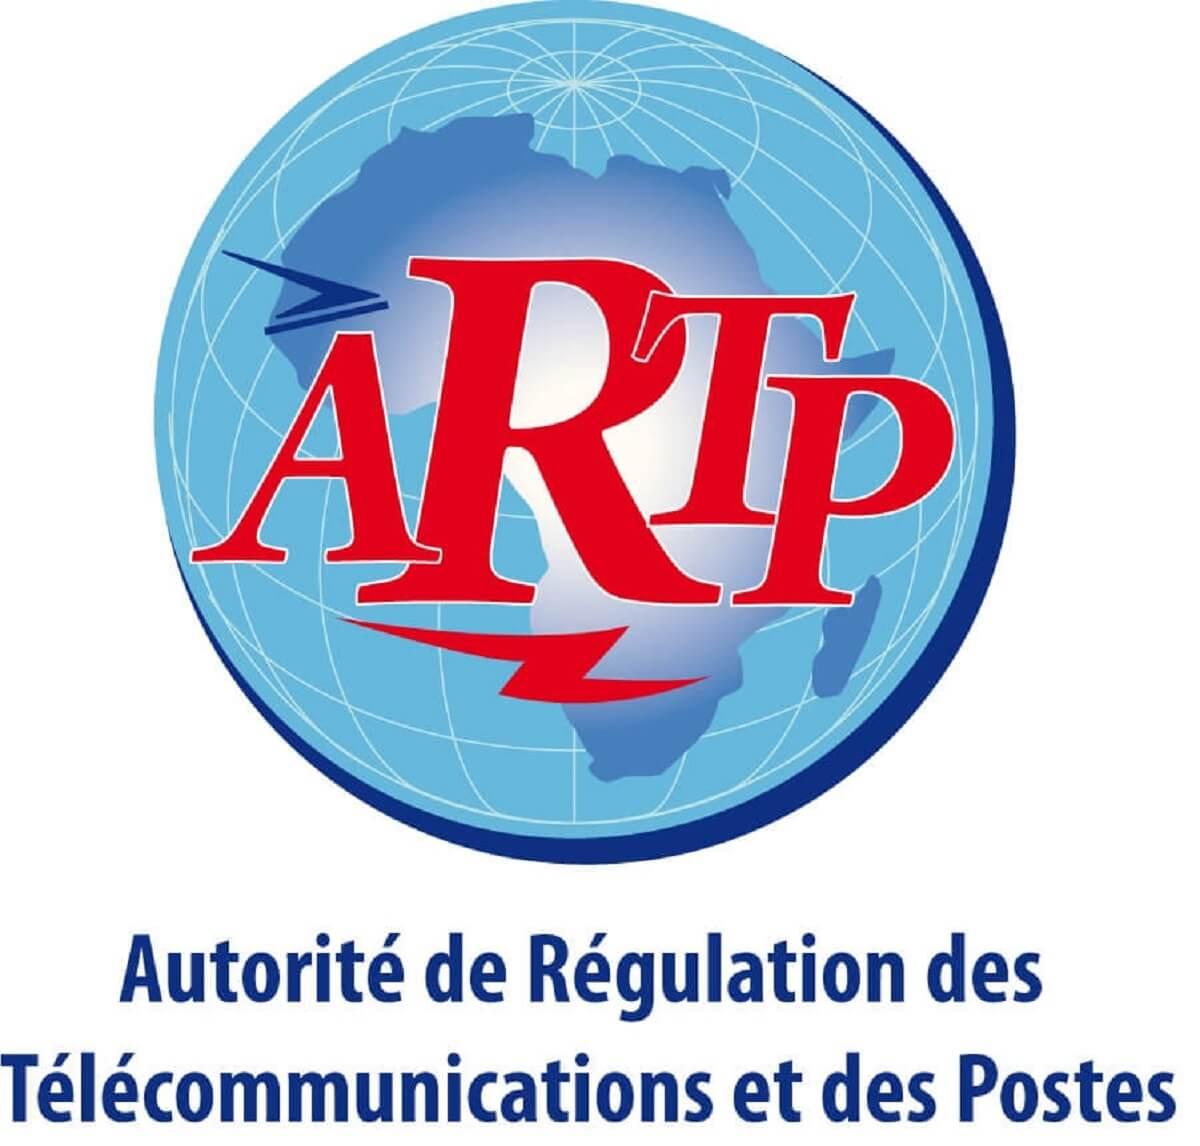 Artp-logo_HD